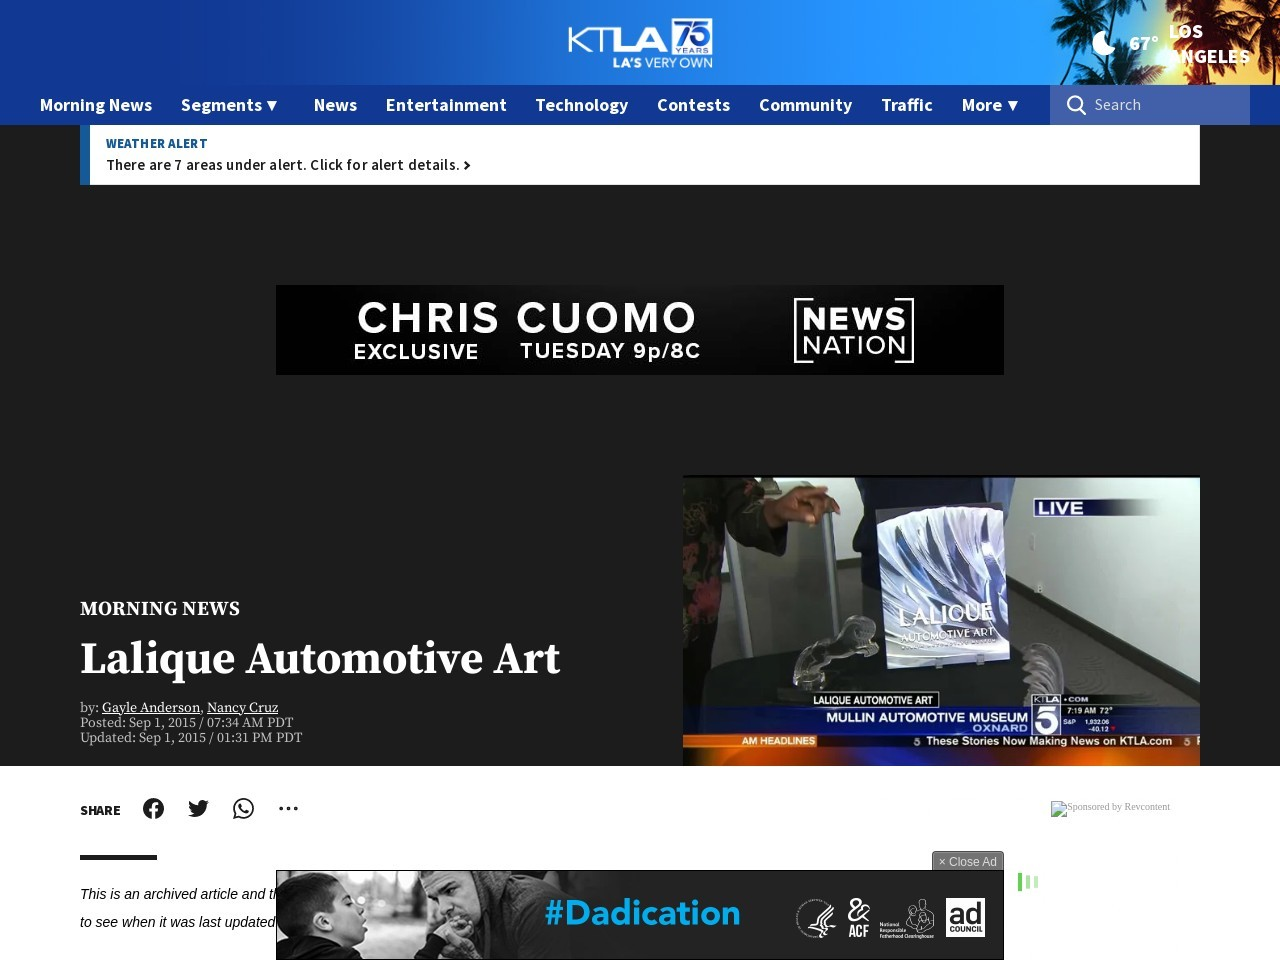 Lalique Automotive Art | KTLA